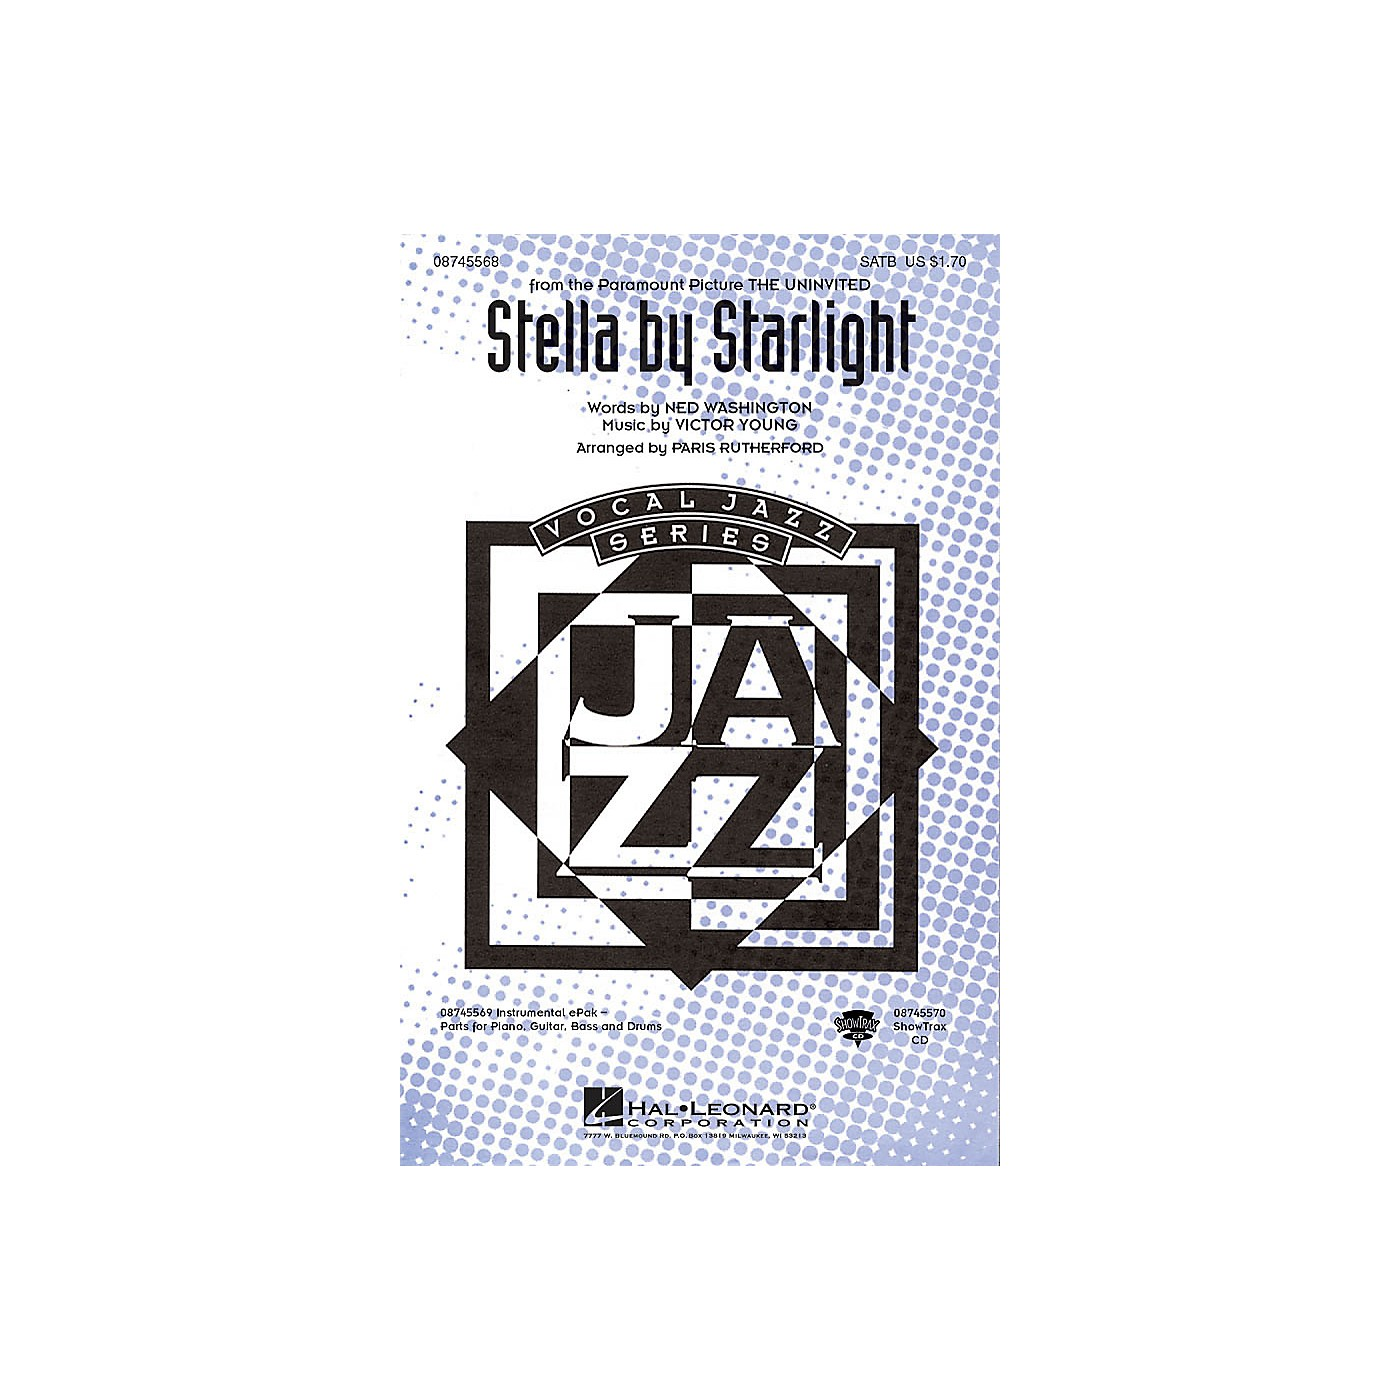 Hal Leonard Stella by Starlight SATB arranged by Paris Rutherford thumbnail